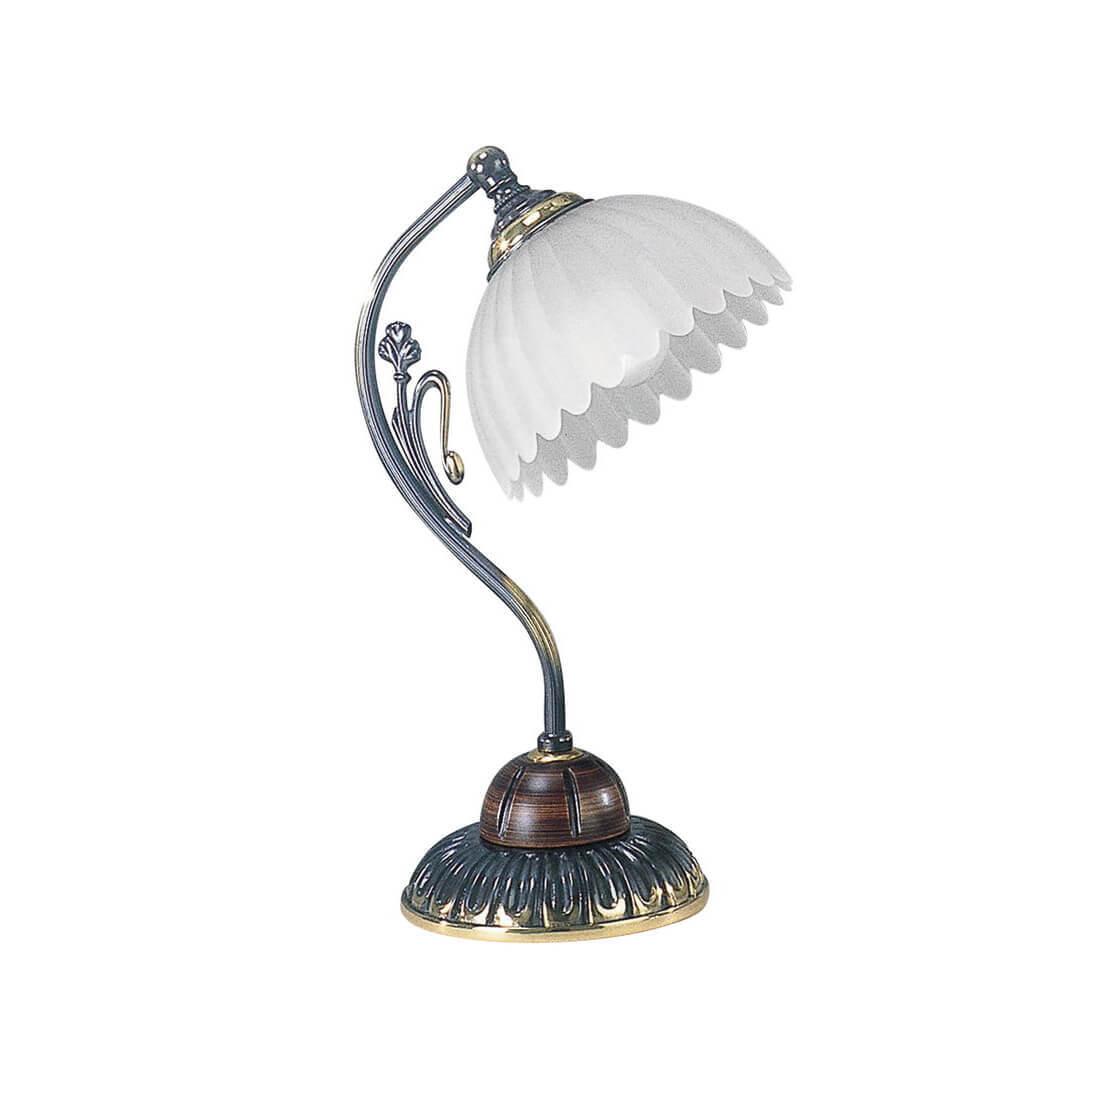 Фото Настольная лампа декоративная Reccagni Angelo 3610 P 2610